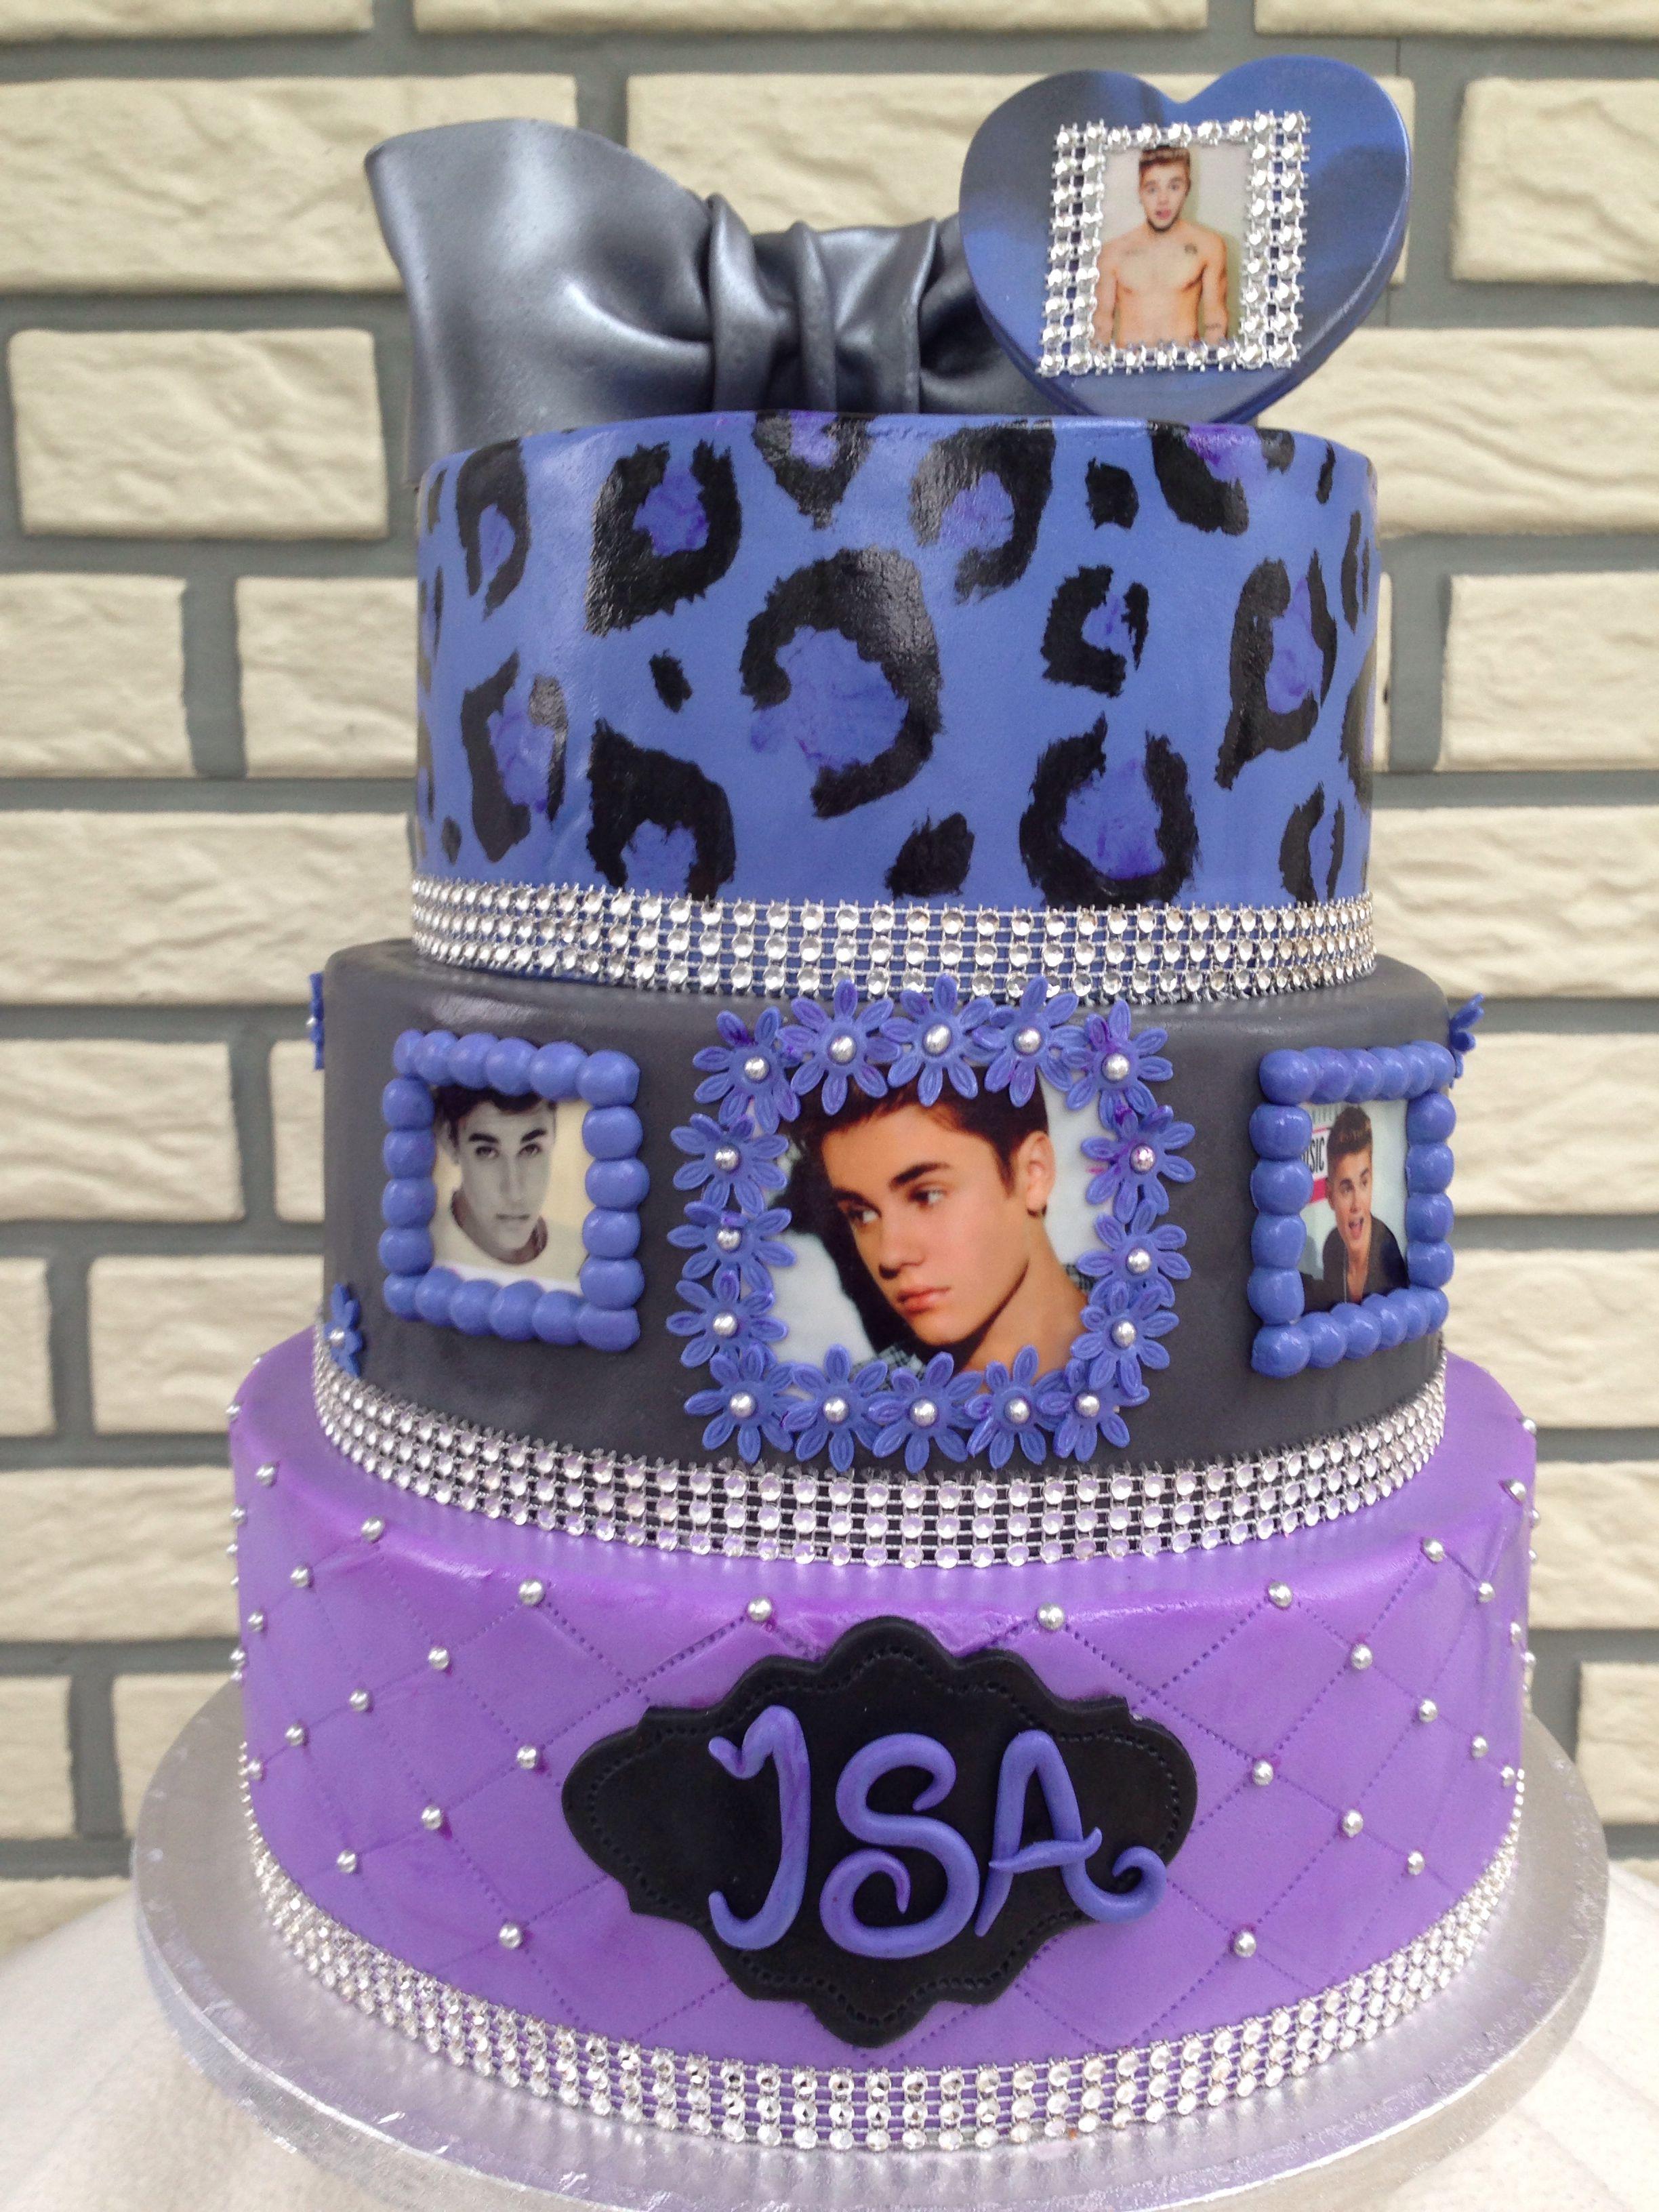 Justin Bieber Cake With Images Justin Bieber Cake Birthday